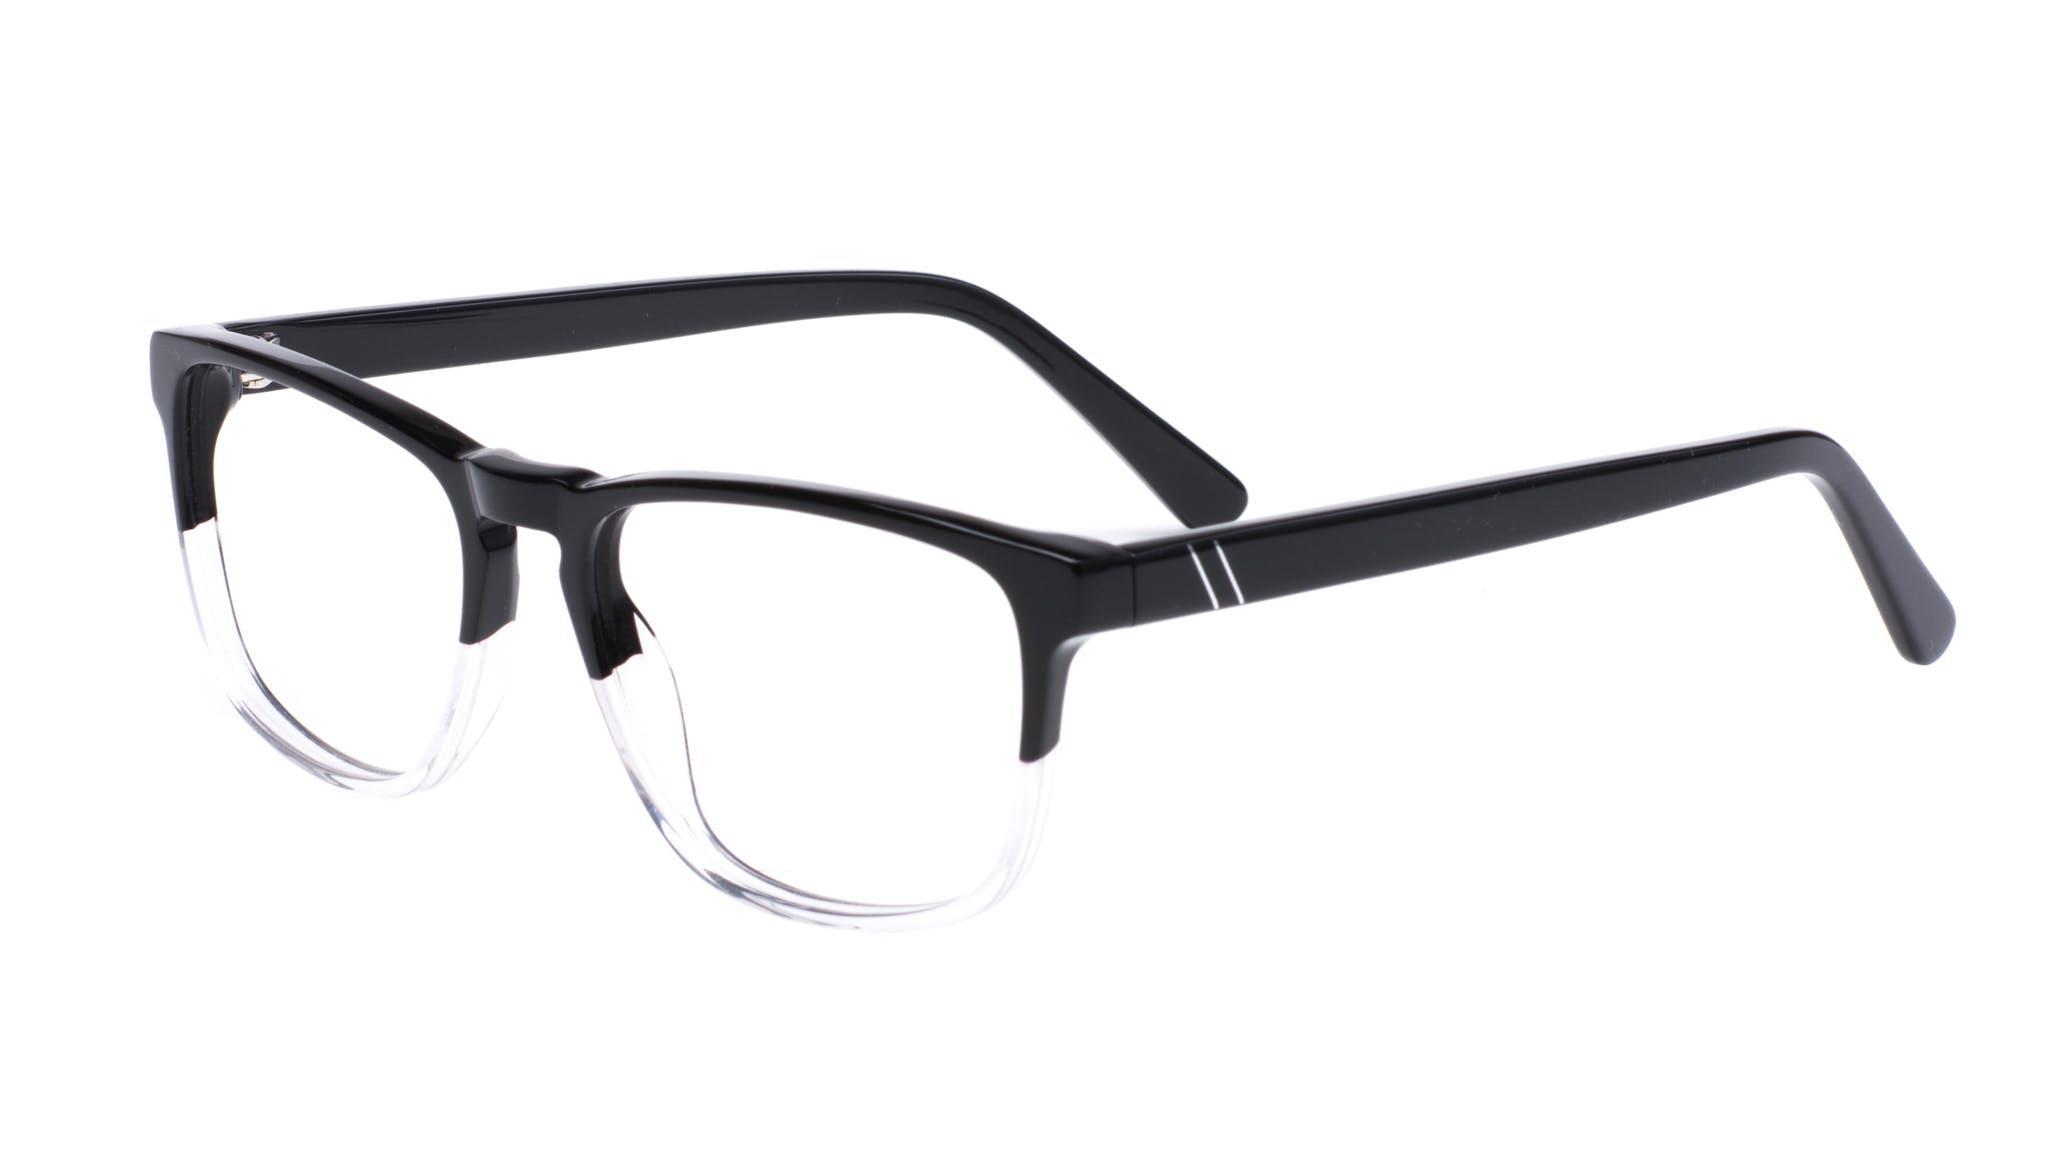 Affordable Fashion Glasses Rectangle Eyeglasses Men Loft Black Diamond Tilt